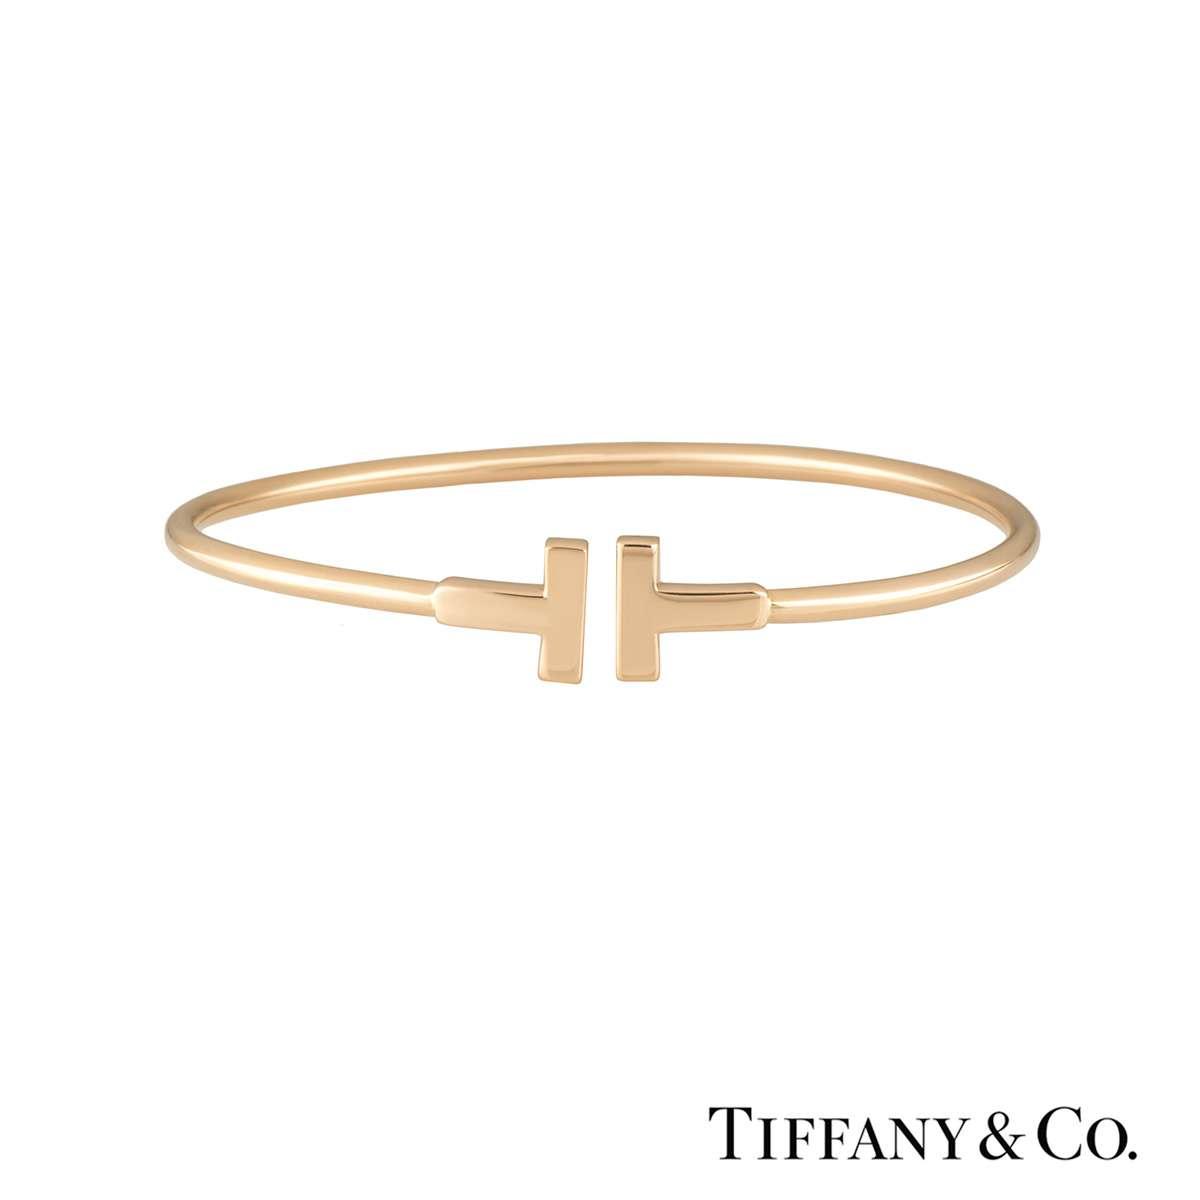 Tiffany & Co. Rose Gold Tiffany T Narrow Wire Bracelet